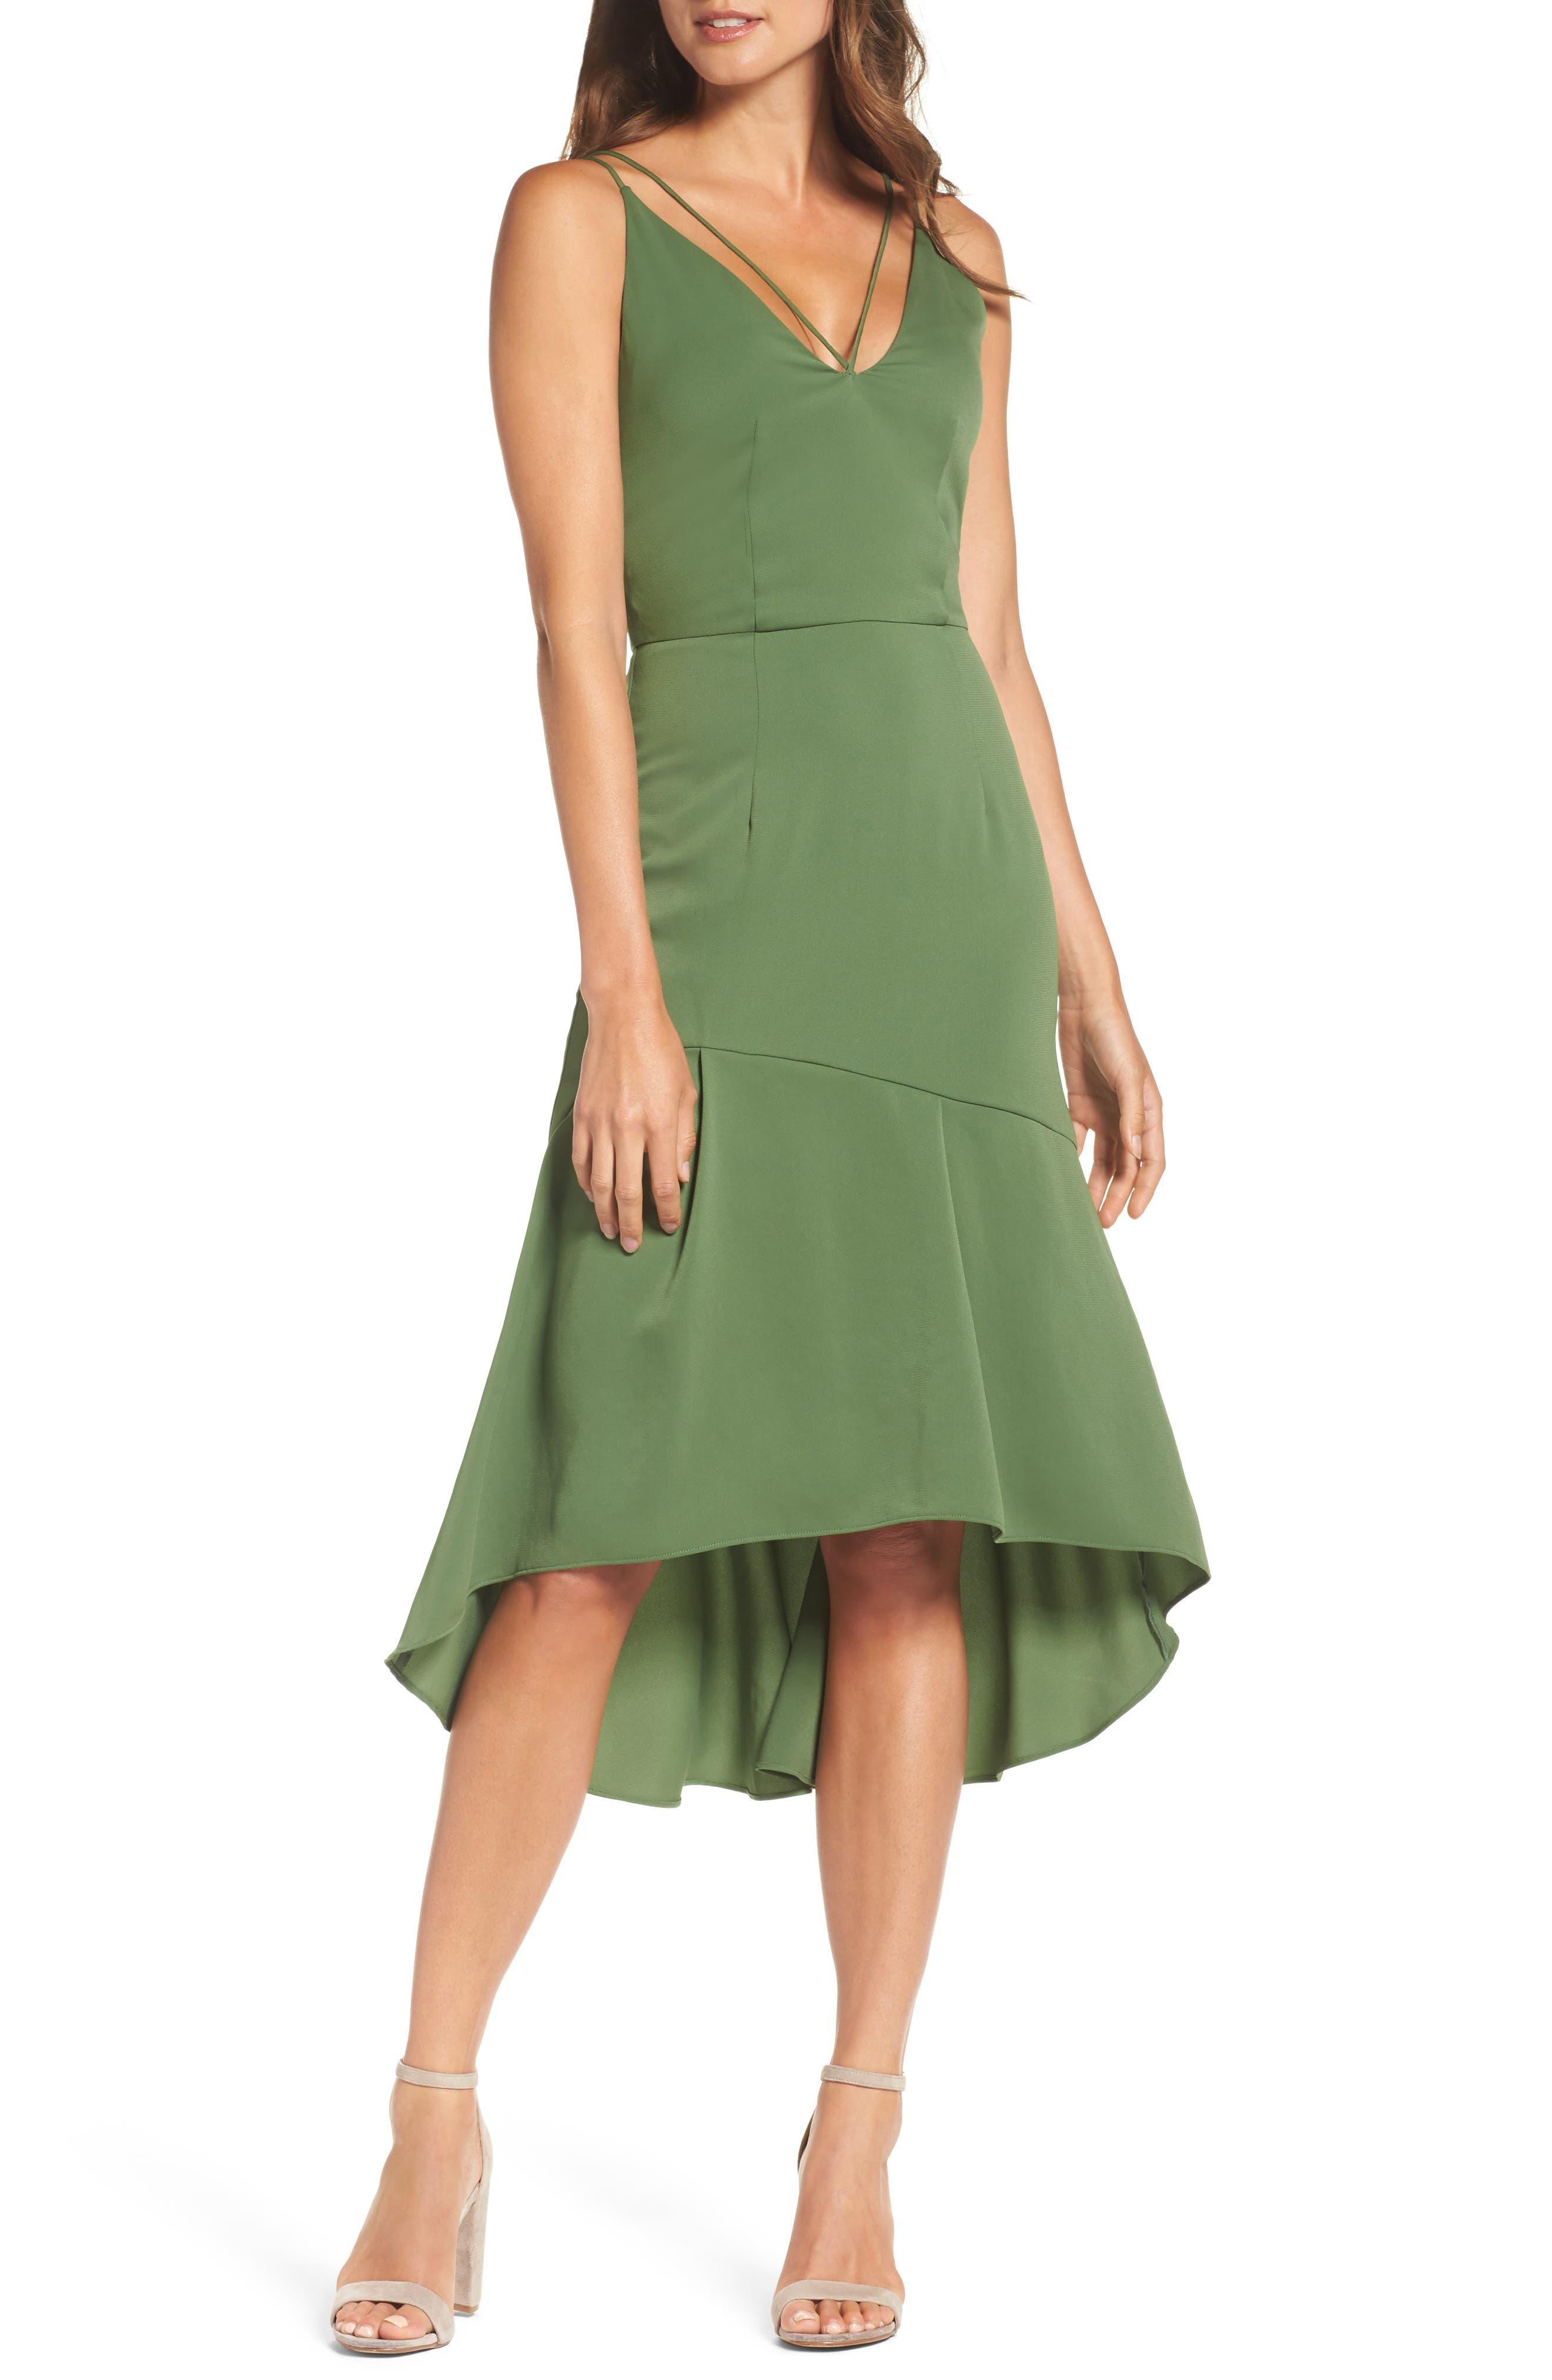 COOPER ST Lovine Midi Dress